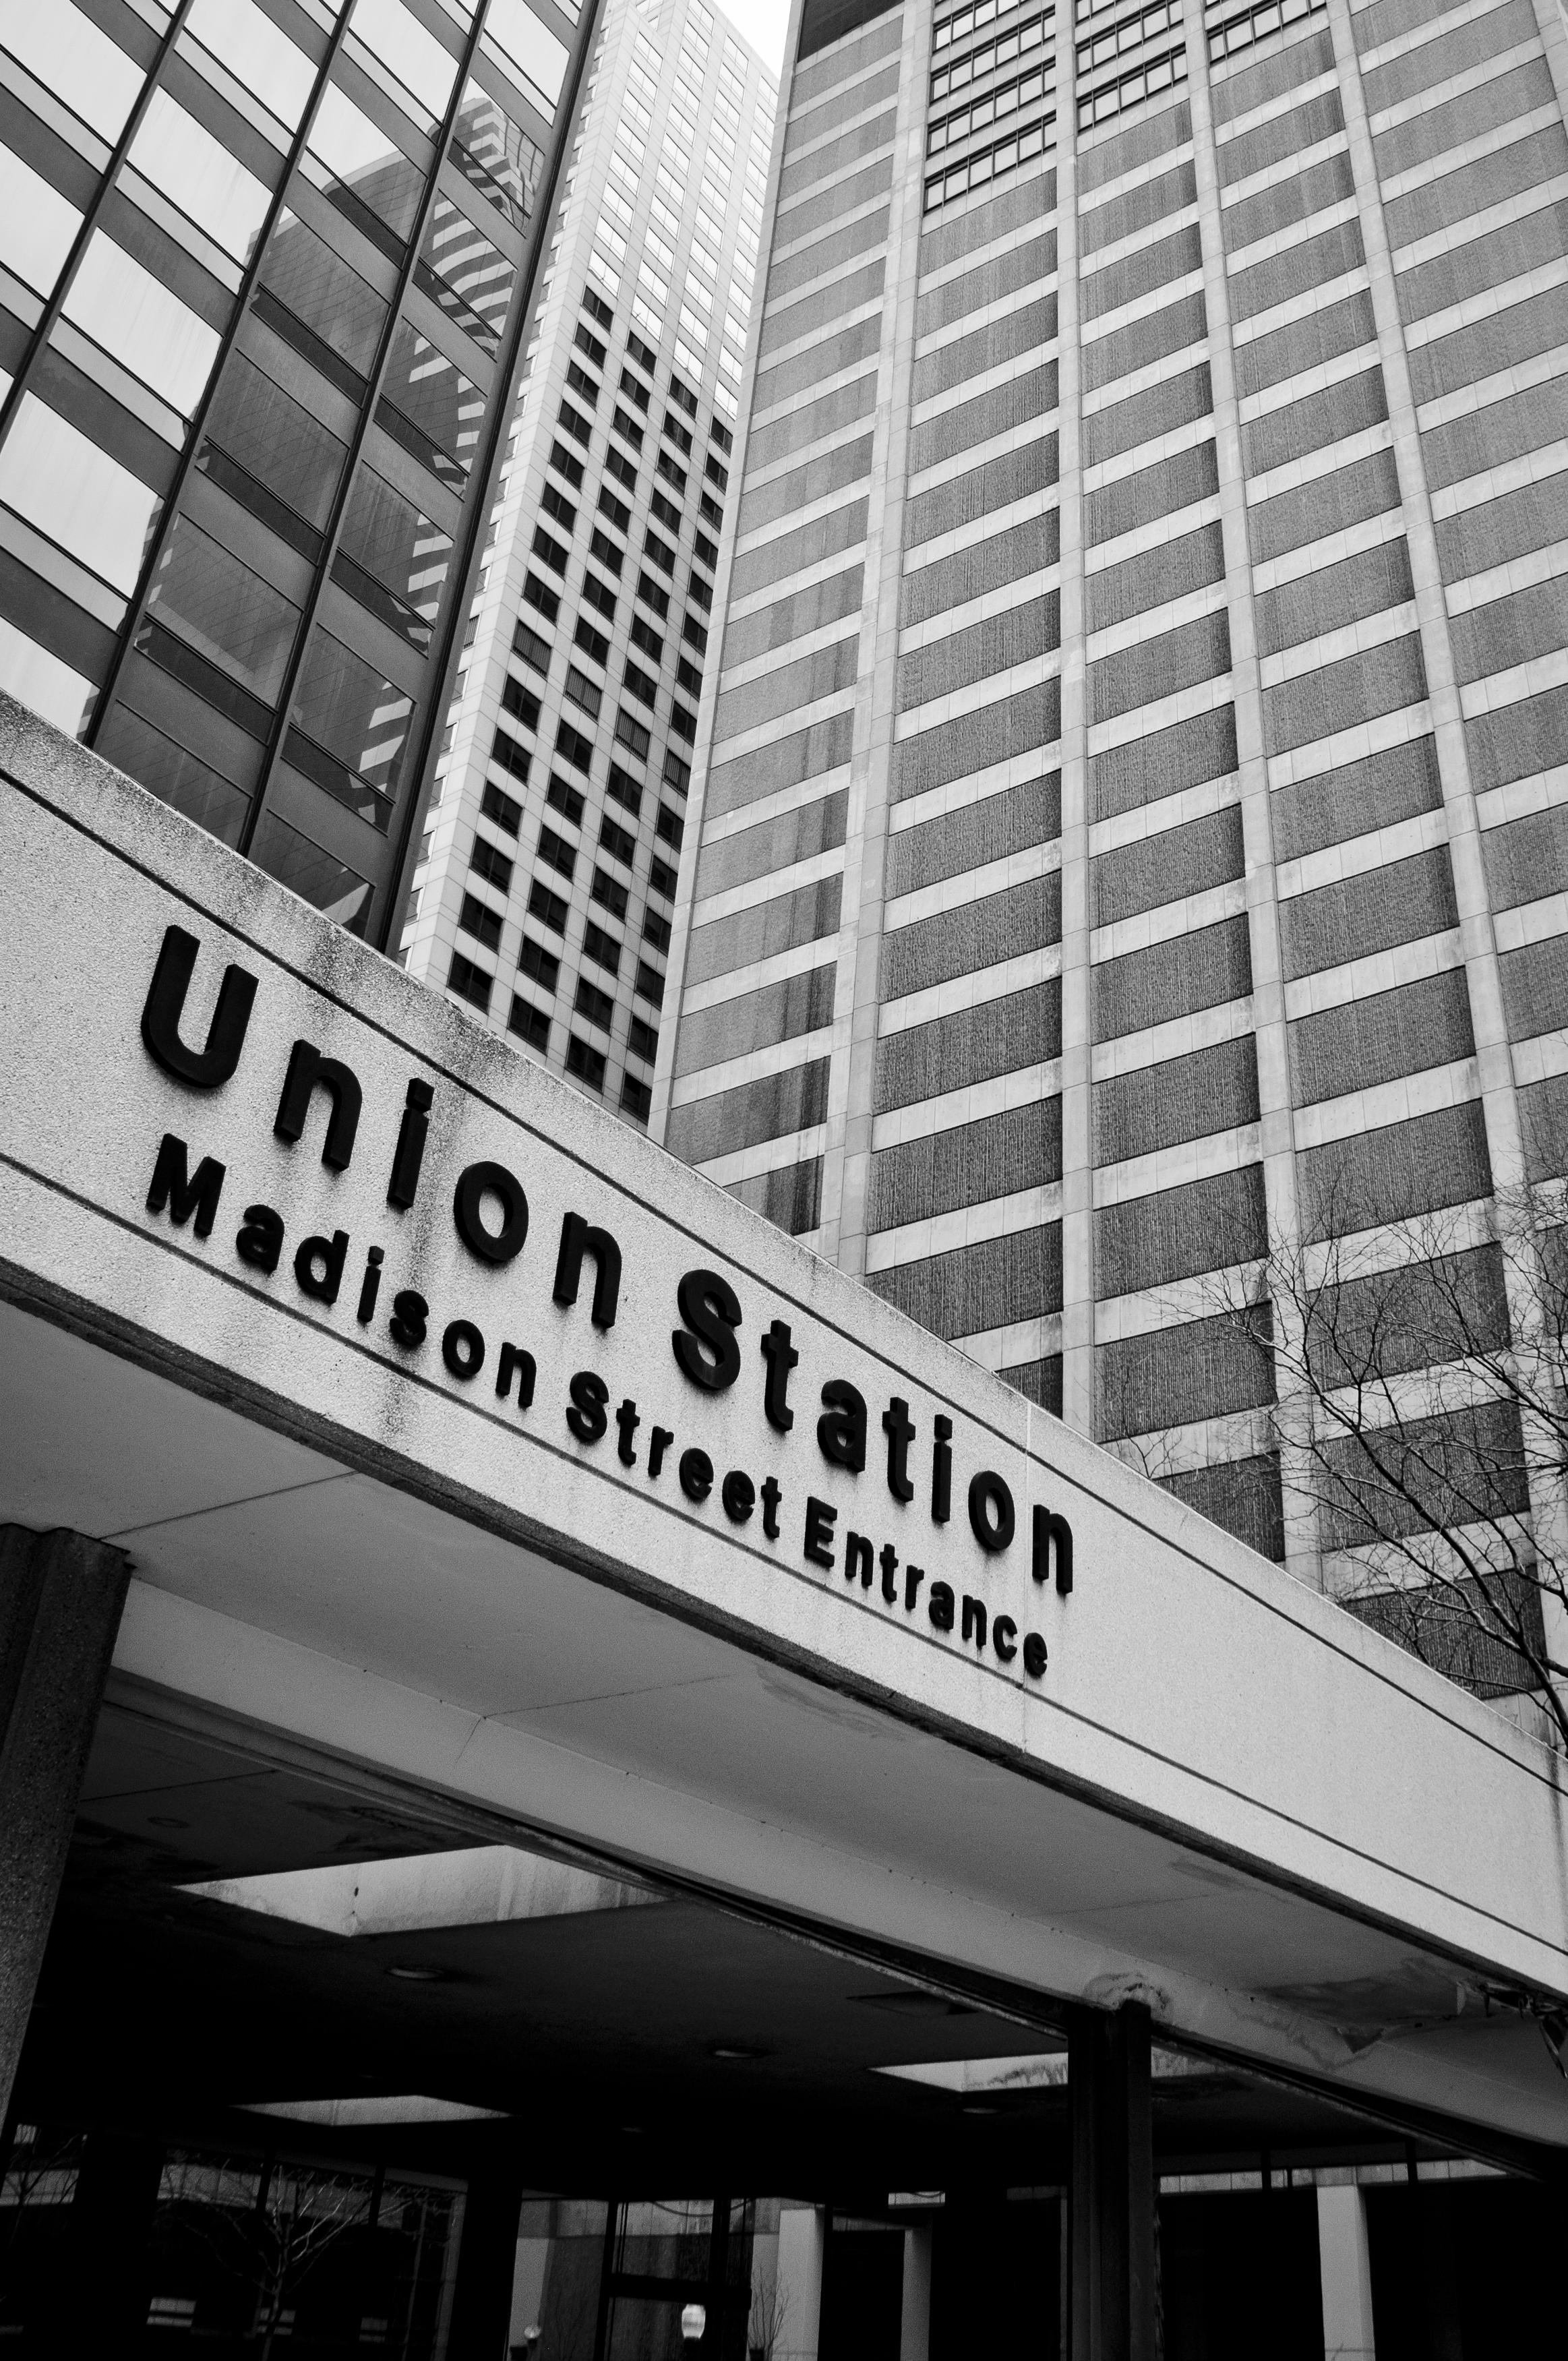 FileUnion Station Madison Street Entrance Jpg - Chicago map union station